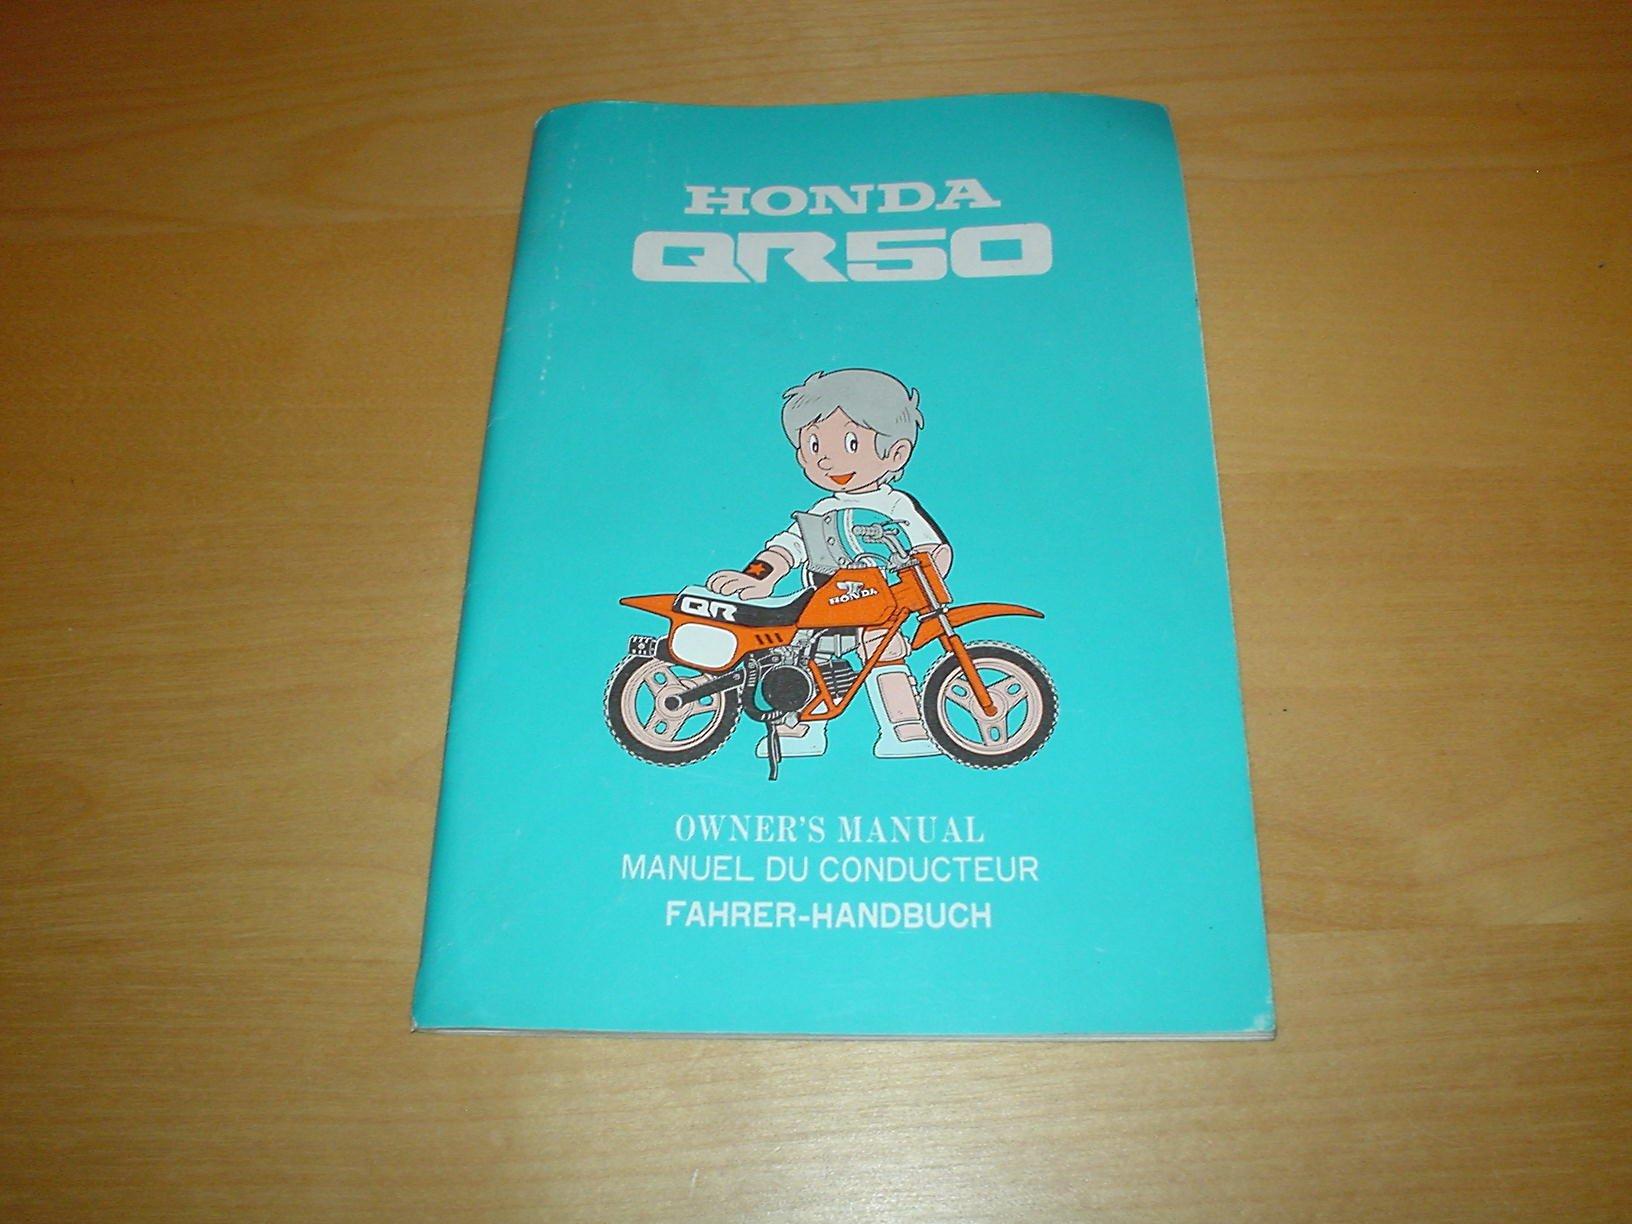 Honda Qr50 Motorcycle Qr 50 Mini Moto 50cc Cc Owners Handbook Wiring Diagram Manual Bike Hand Book Books